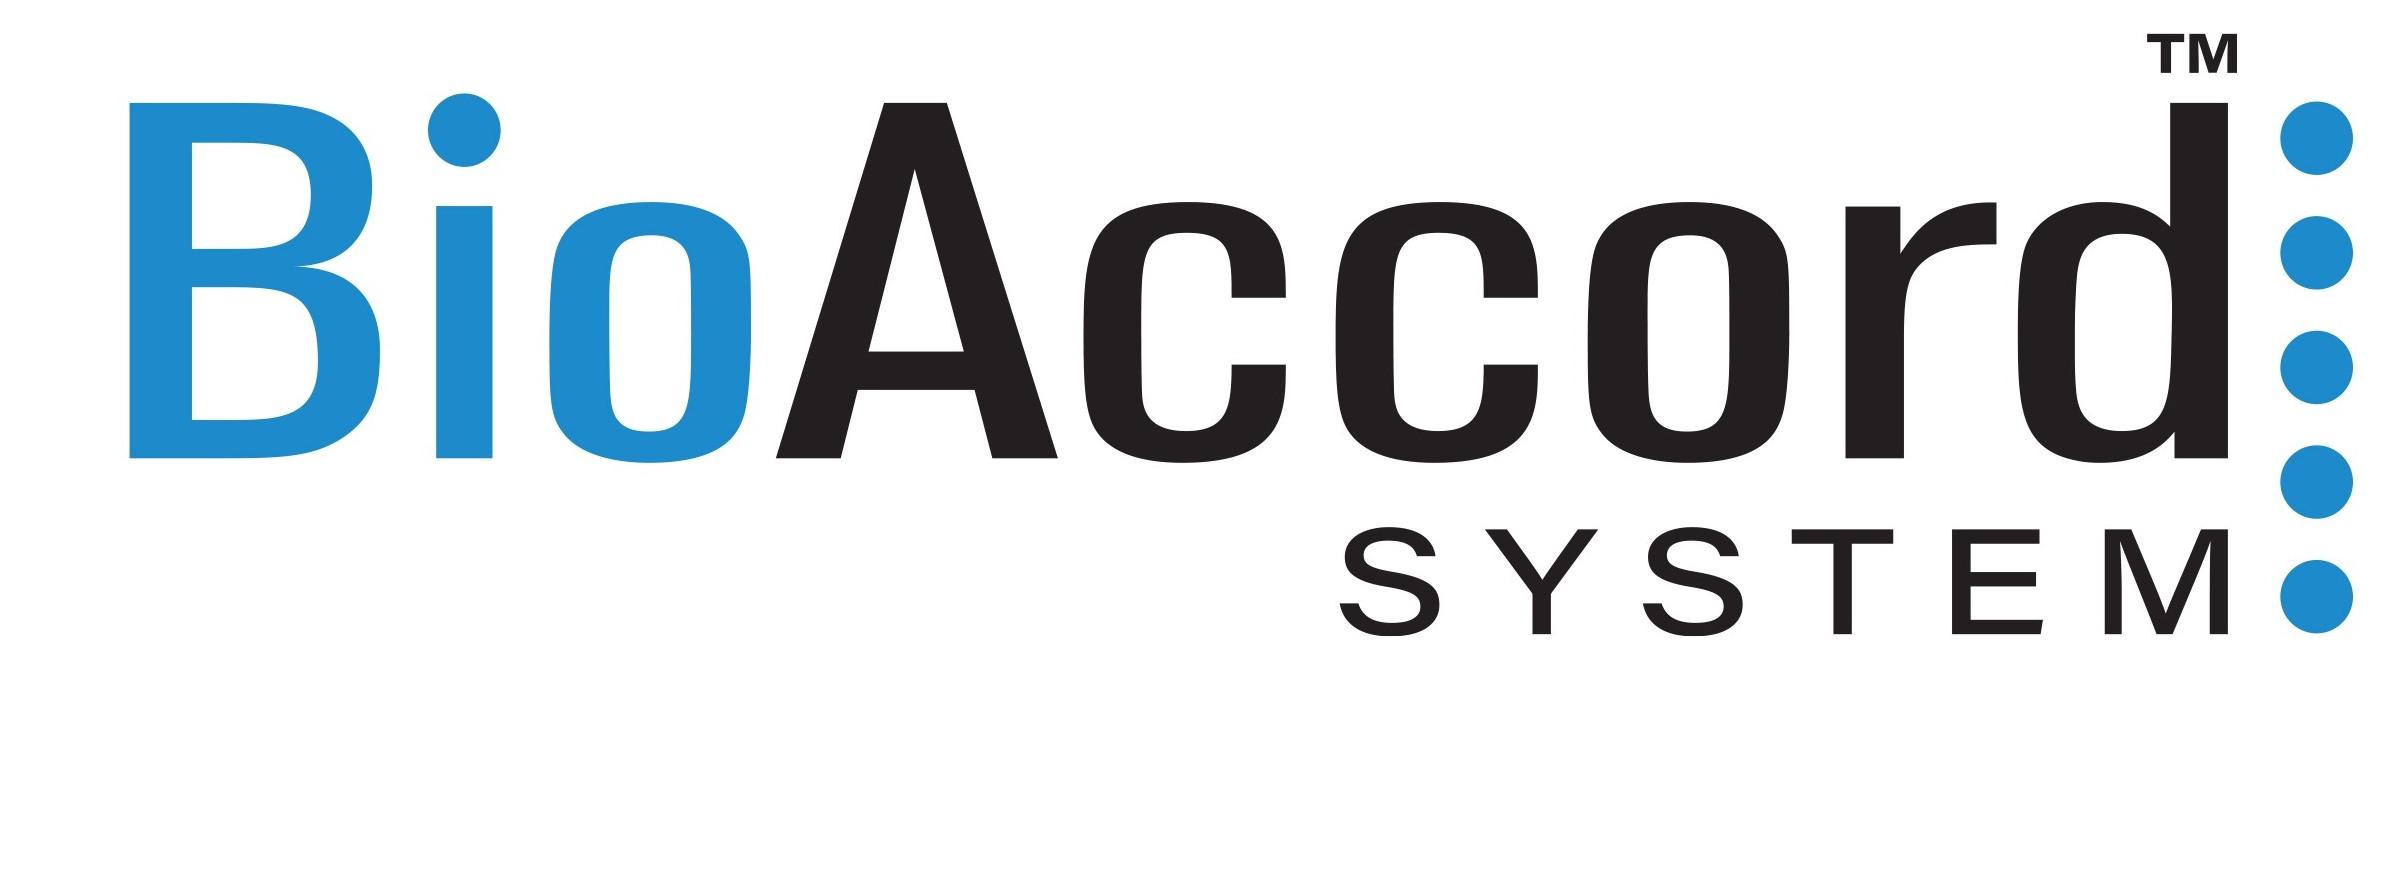 Bioaccord system